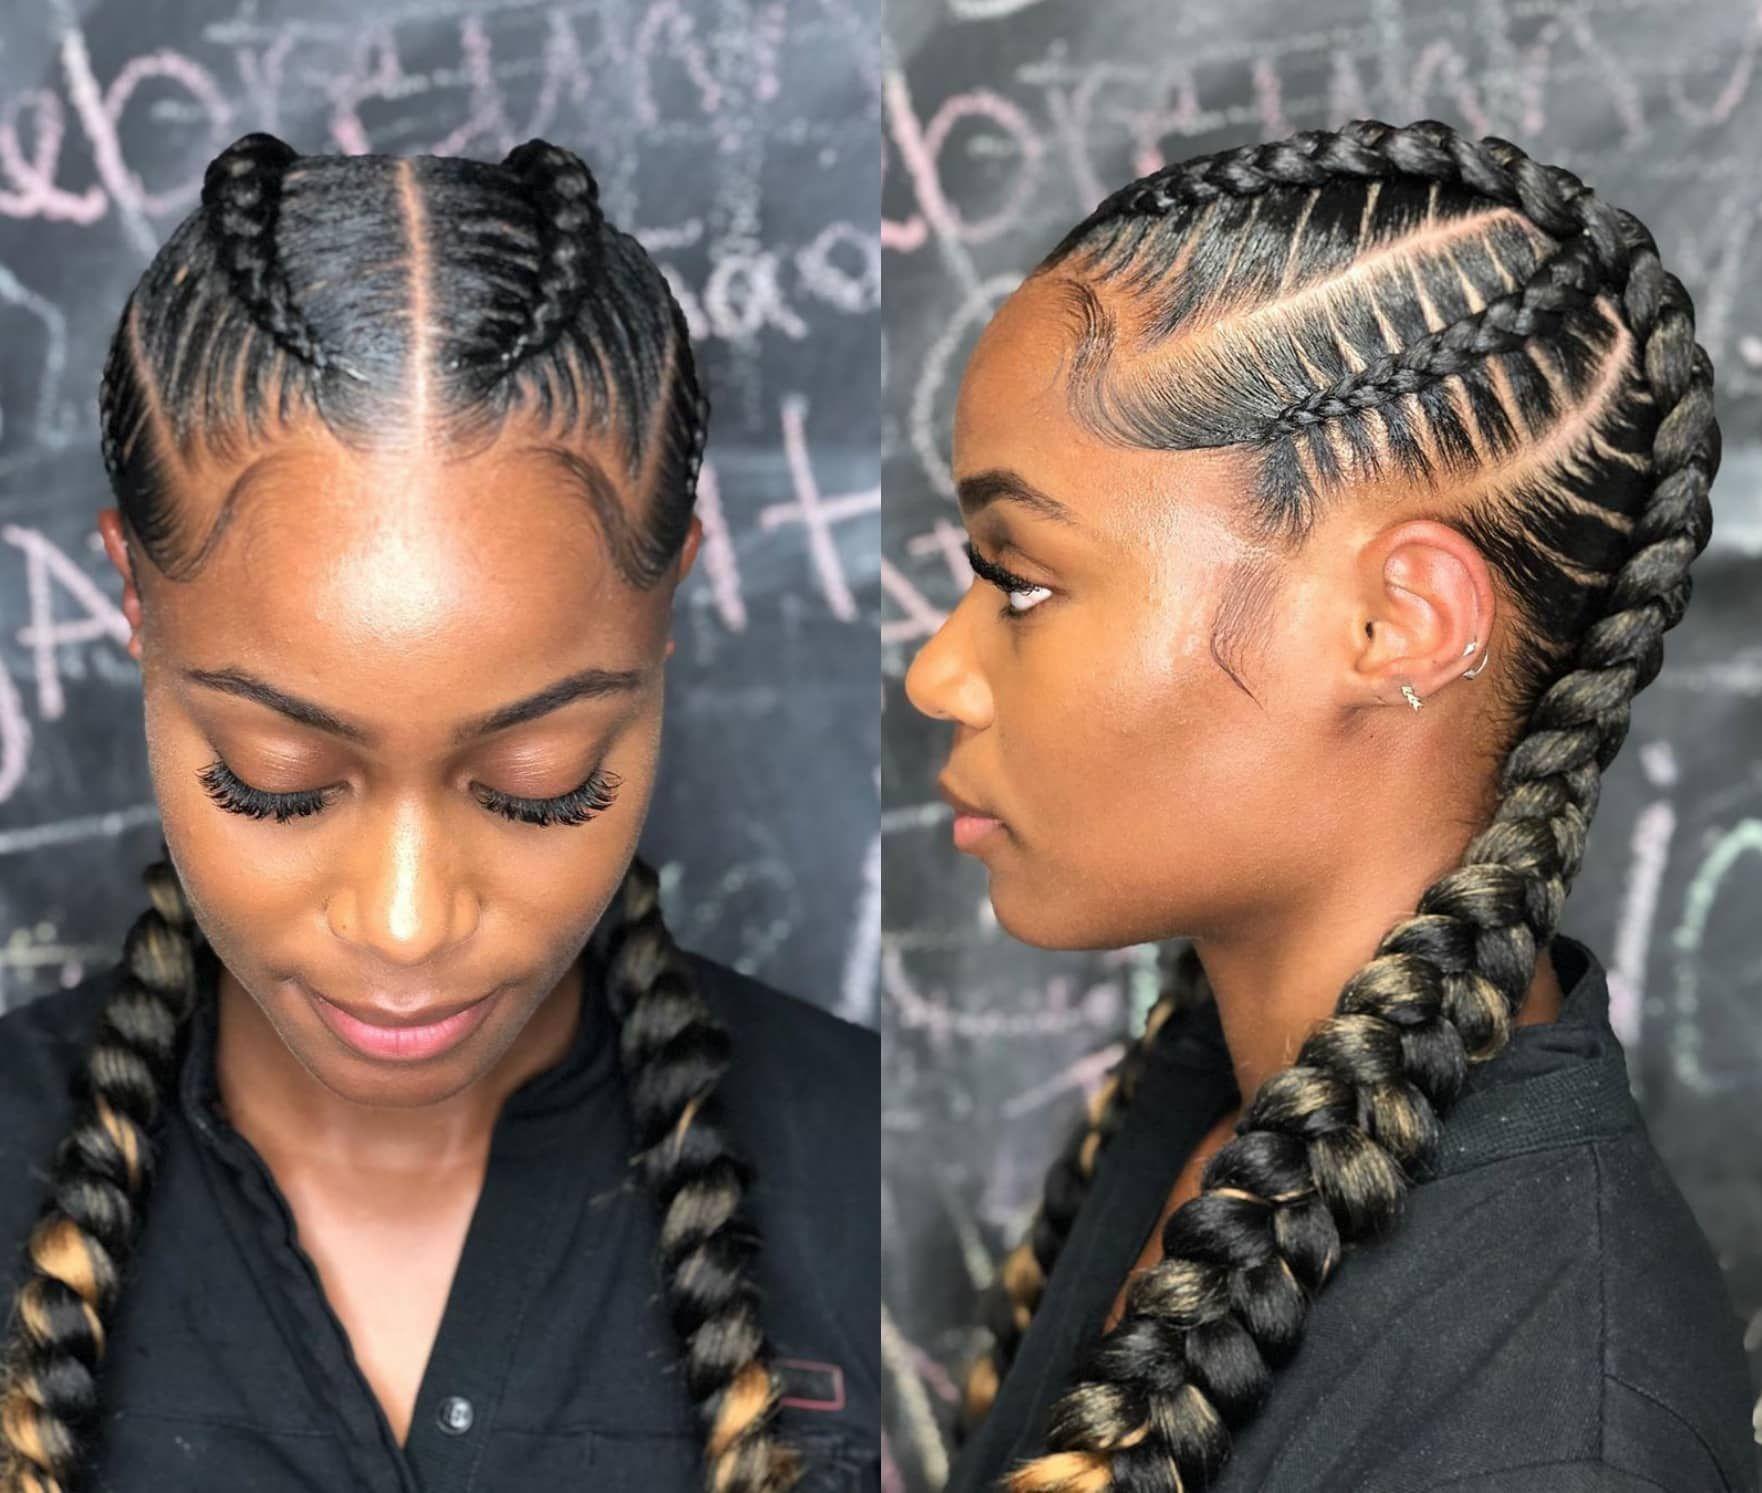 25 Must Have Goddess In 2020 Goddess Braids Hairstyles Feed In Braids Hairstyles Two Braid Hairstyles